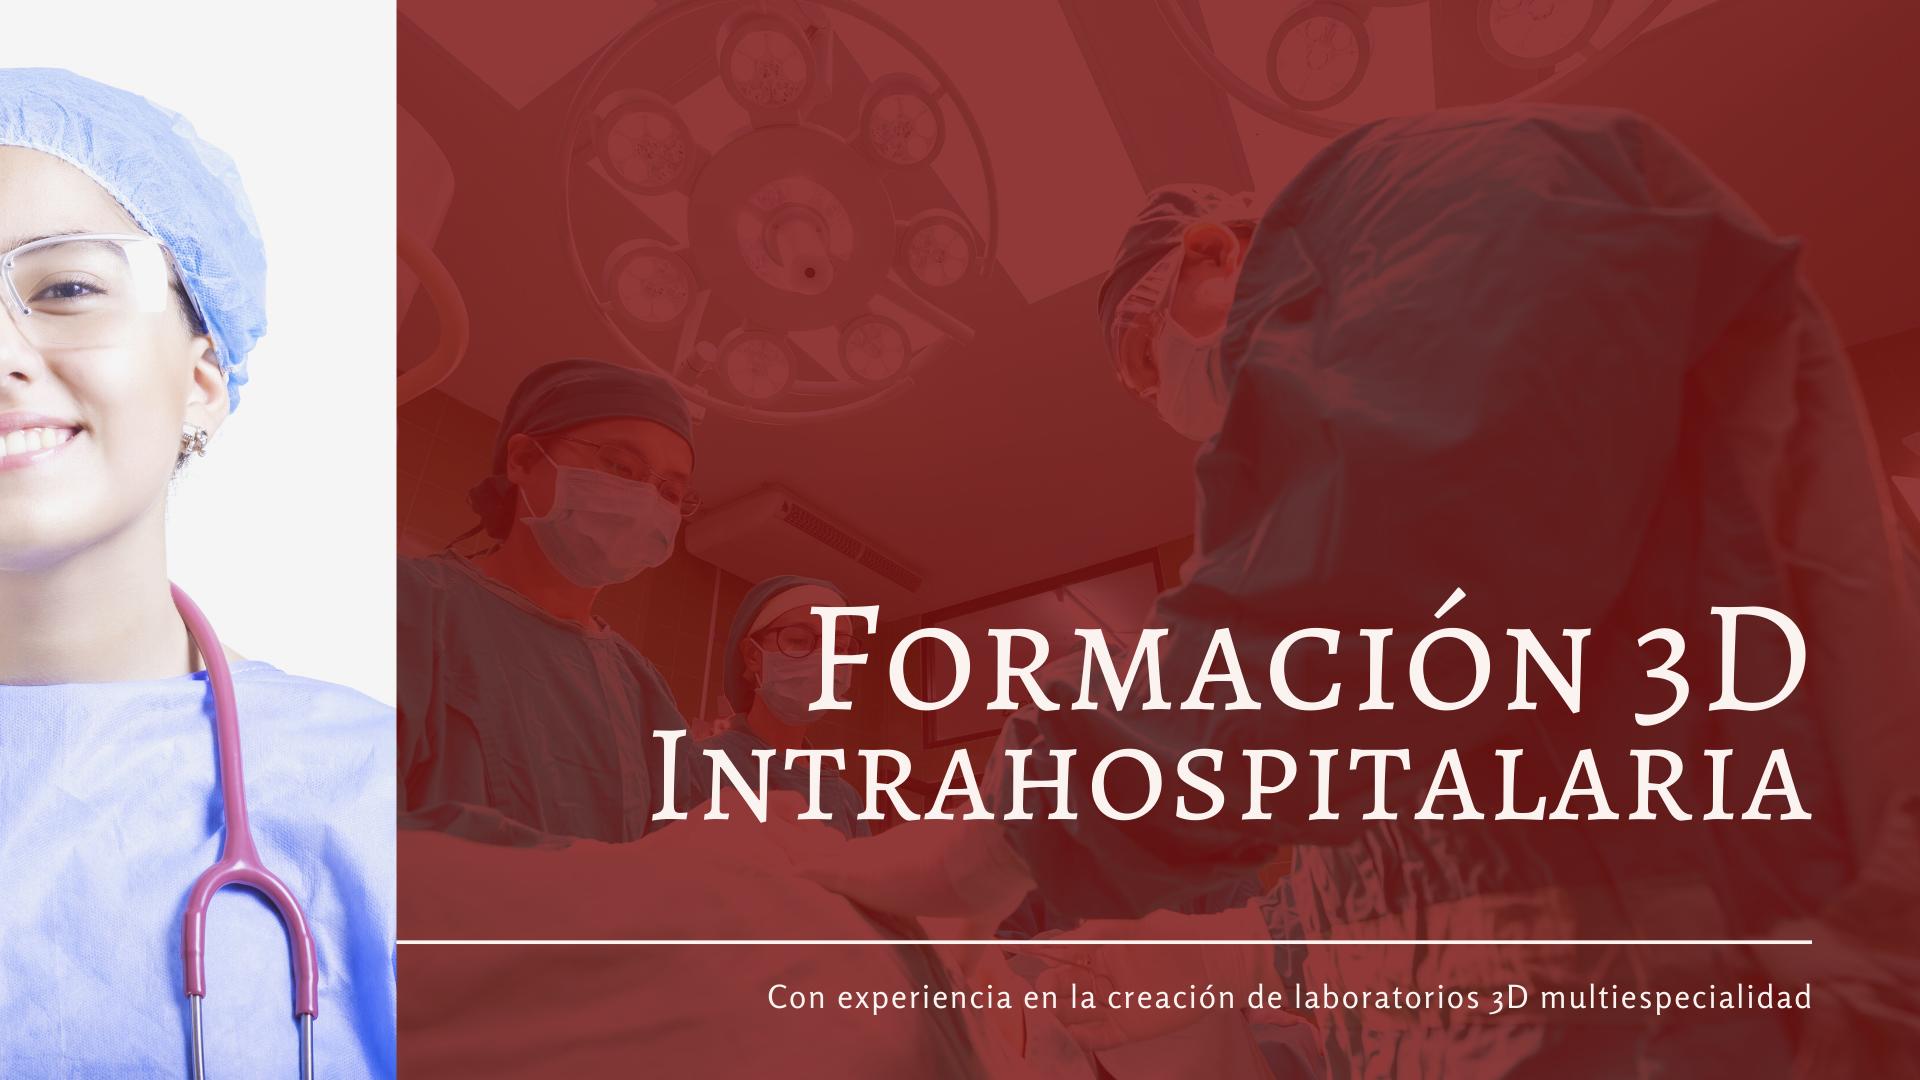 Formacion 3D intrahospitalaria